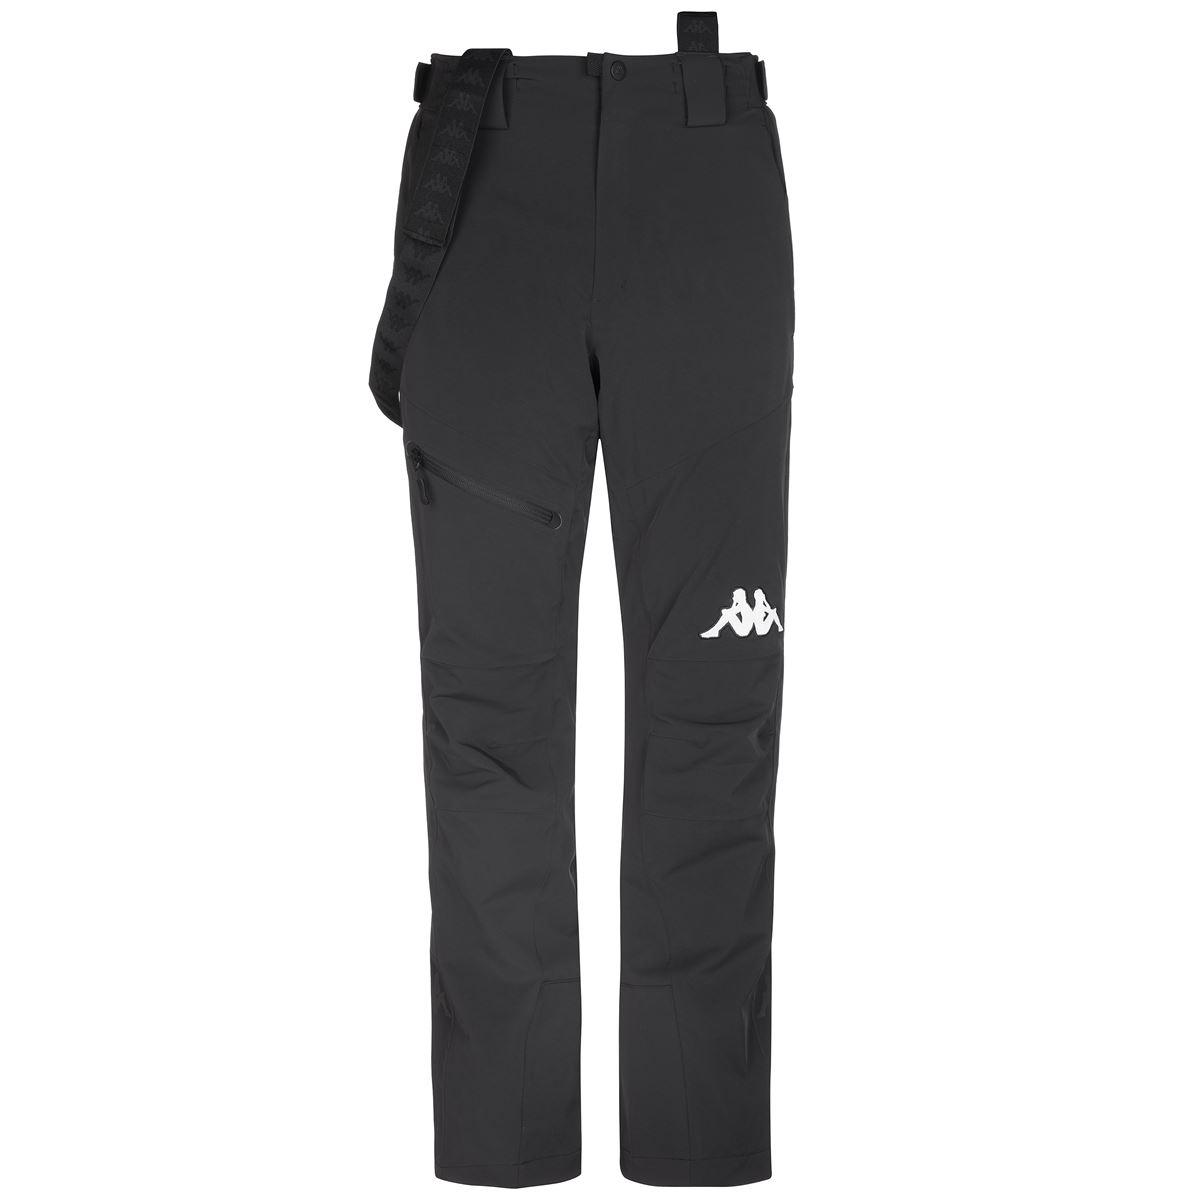 Kappa Pantaloni uomo-304SHB0